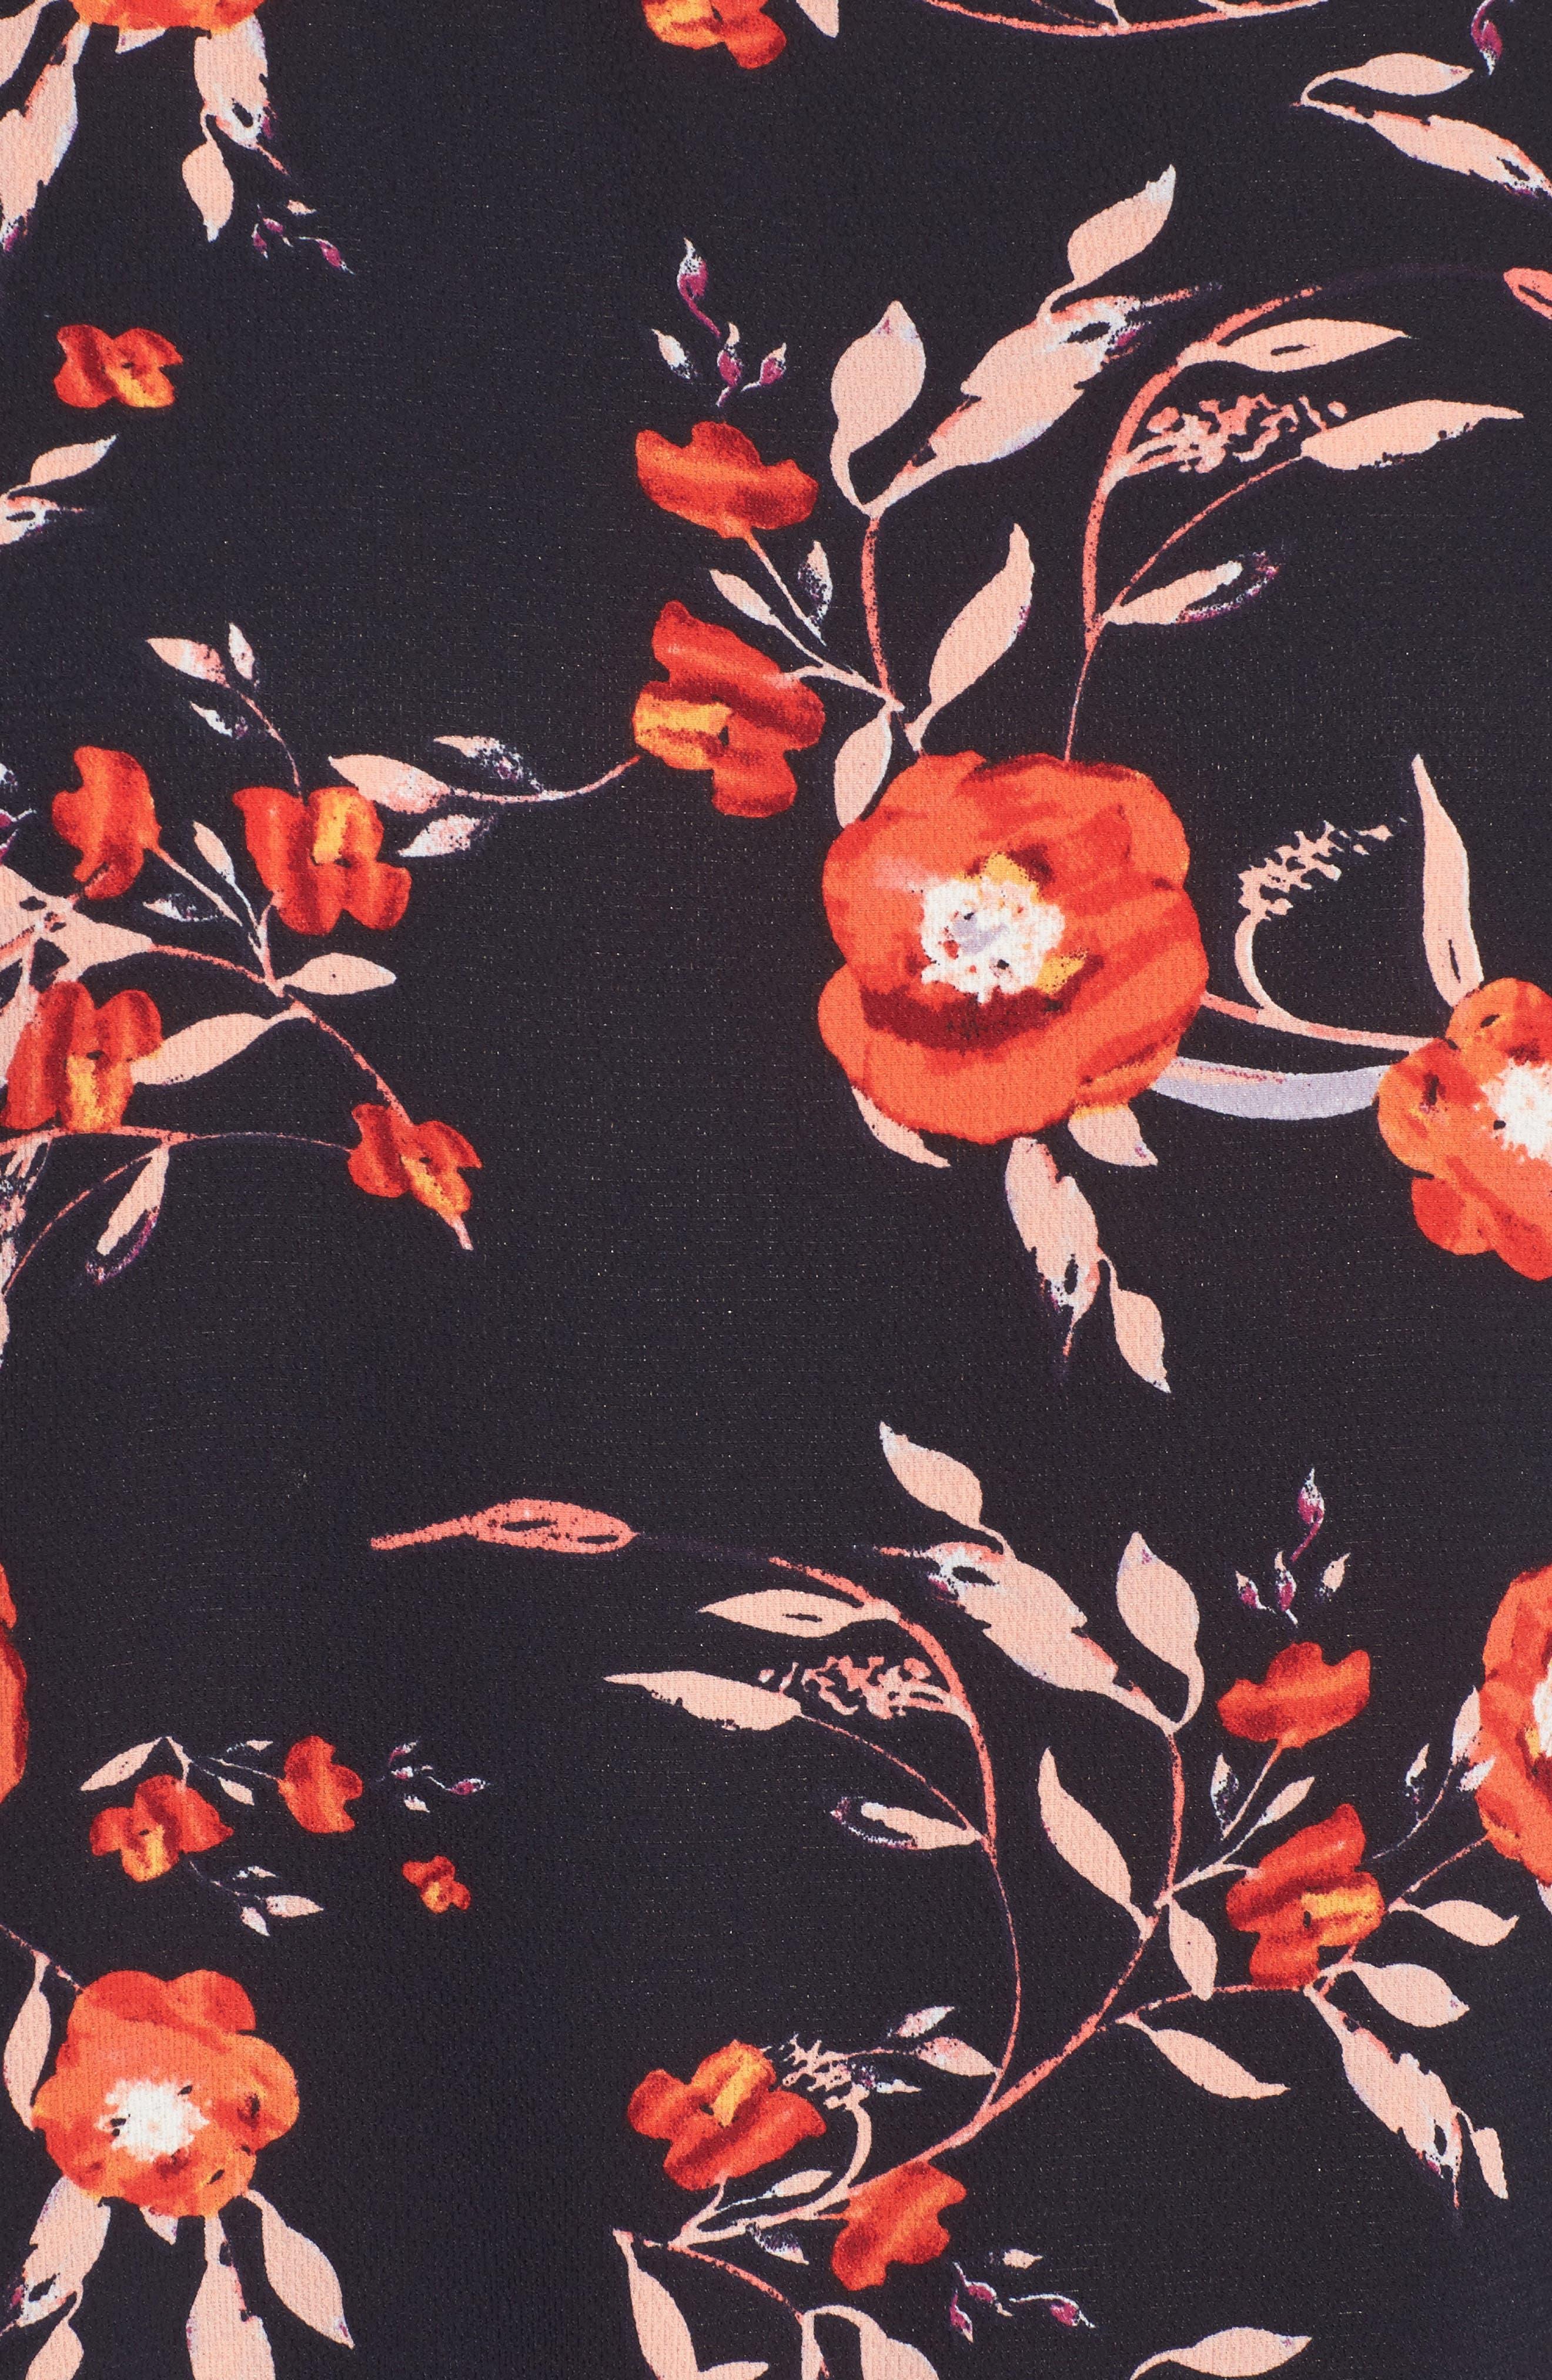 Ruffle Asymmetrical Blouse,                             Alternate thumbnail 5, color,                             Floral Print